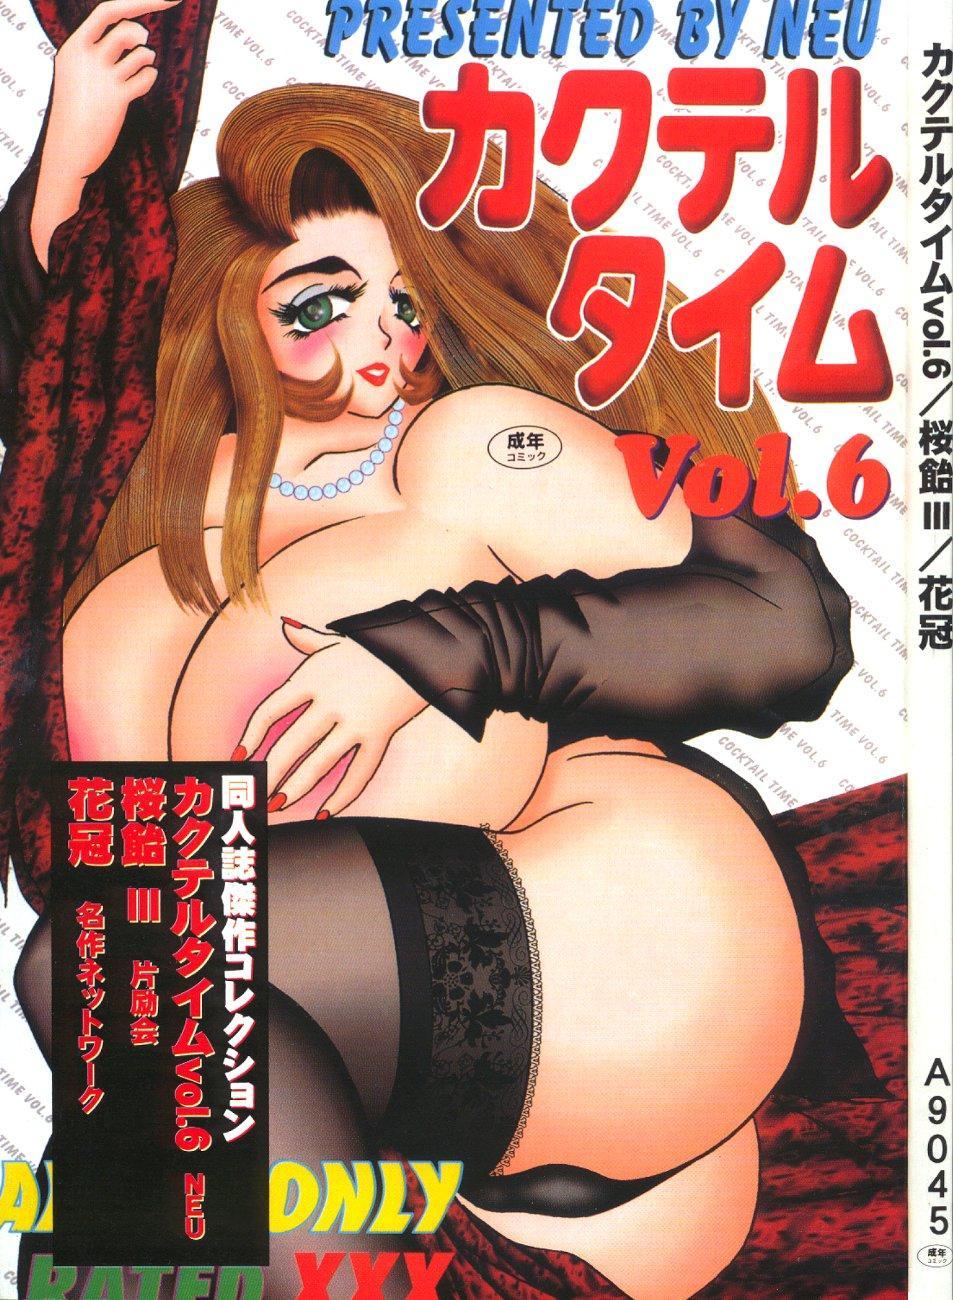 Cocktail Time Vol. 6 Sakura Ame III Hana Kanmuri 1